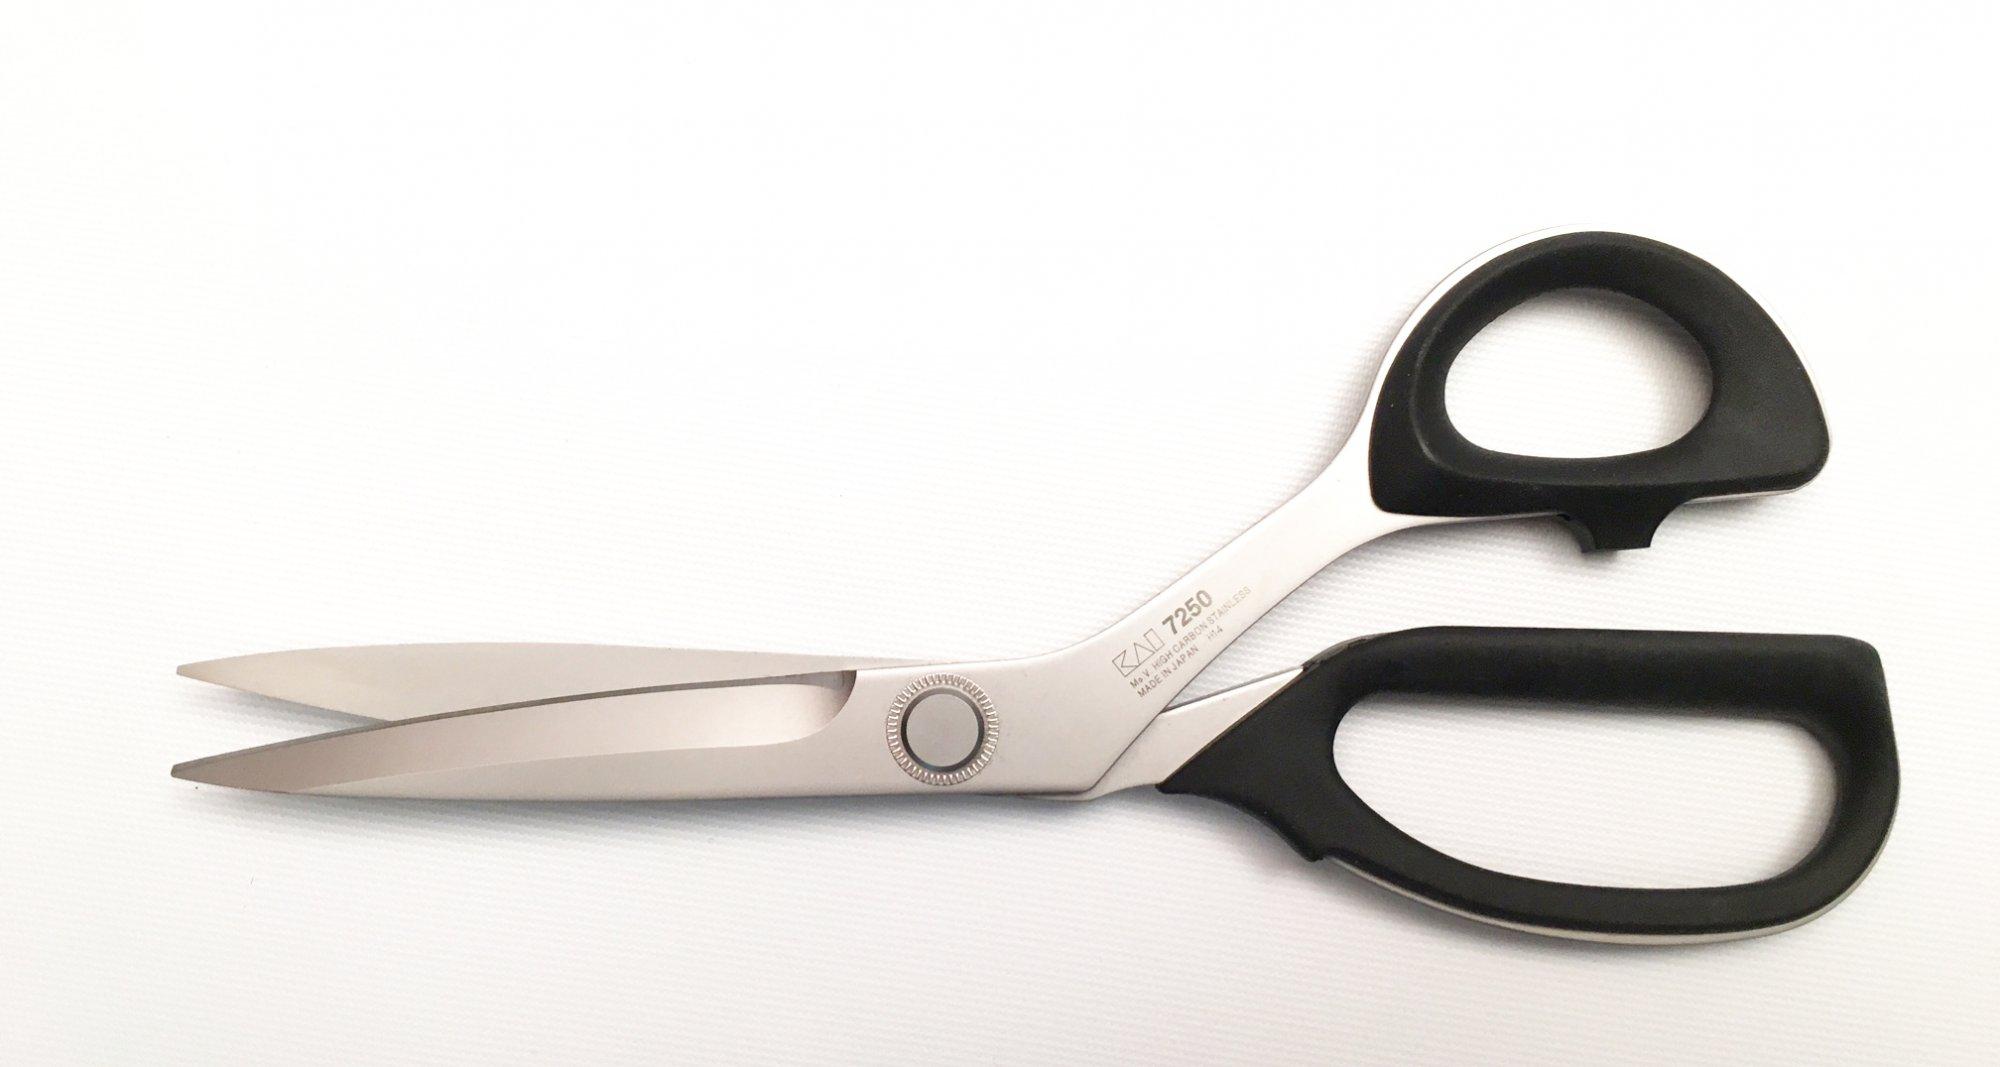 KAI Lefty Professional Shears - 10 inch